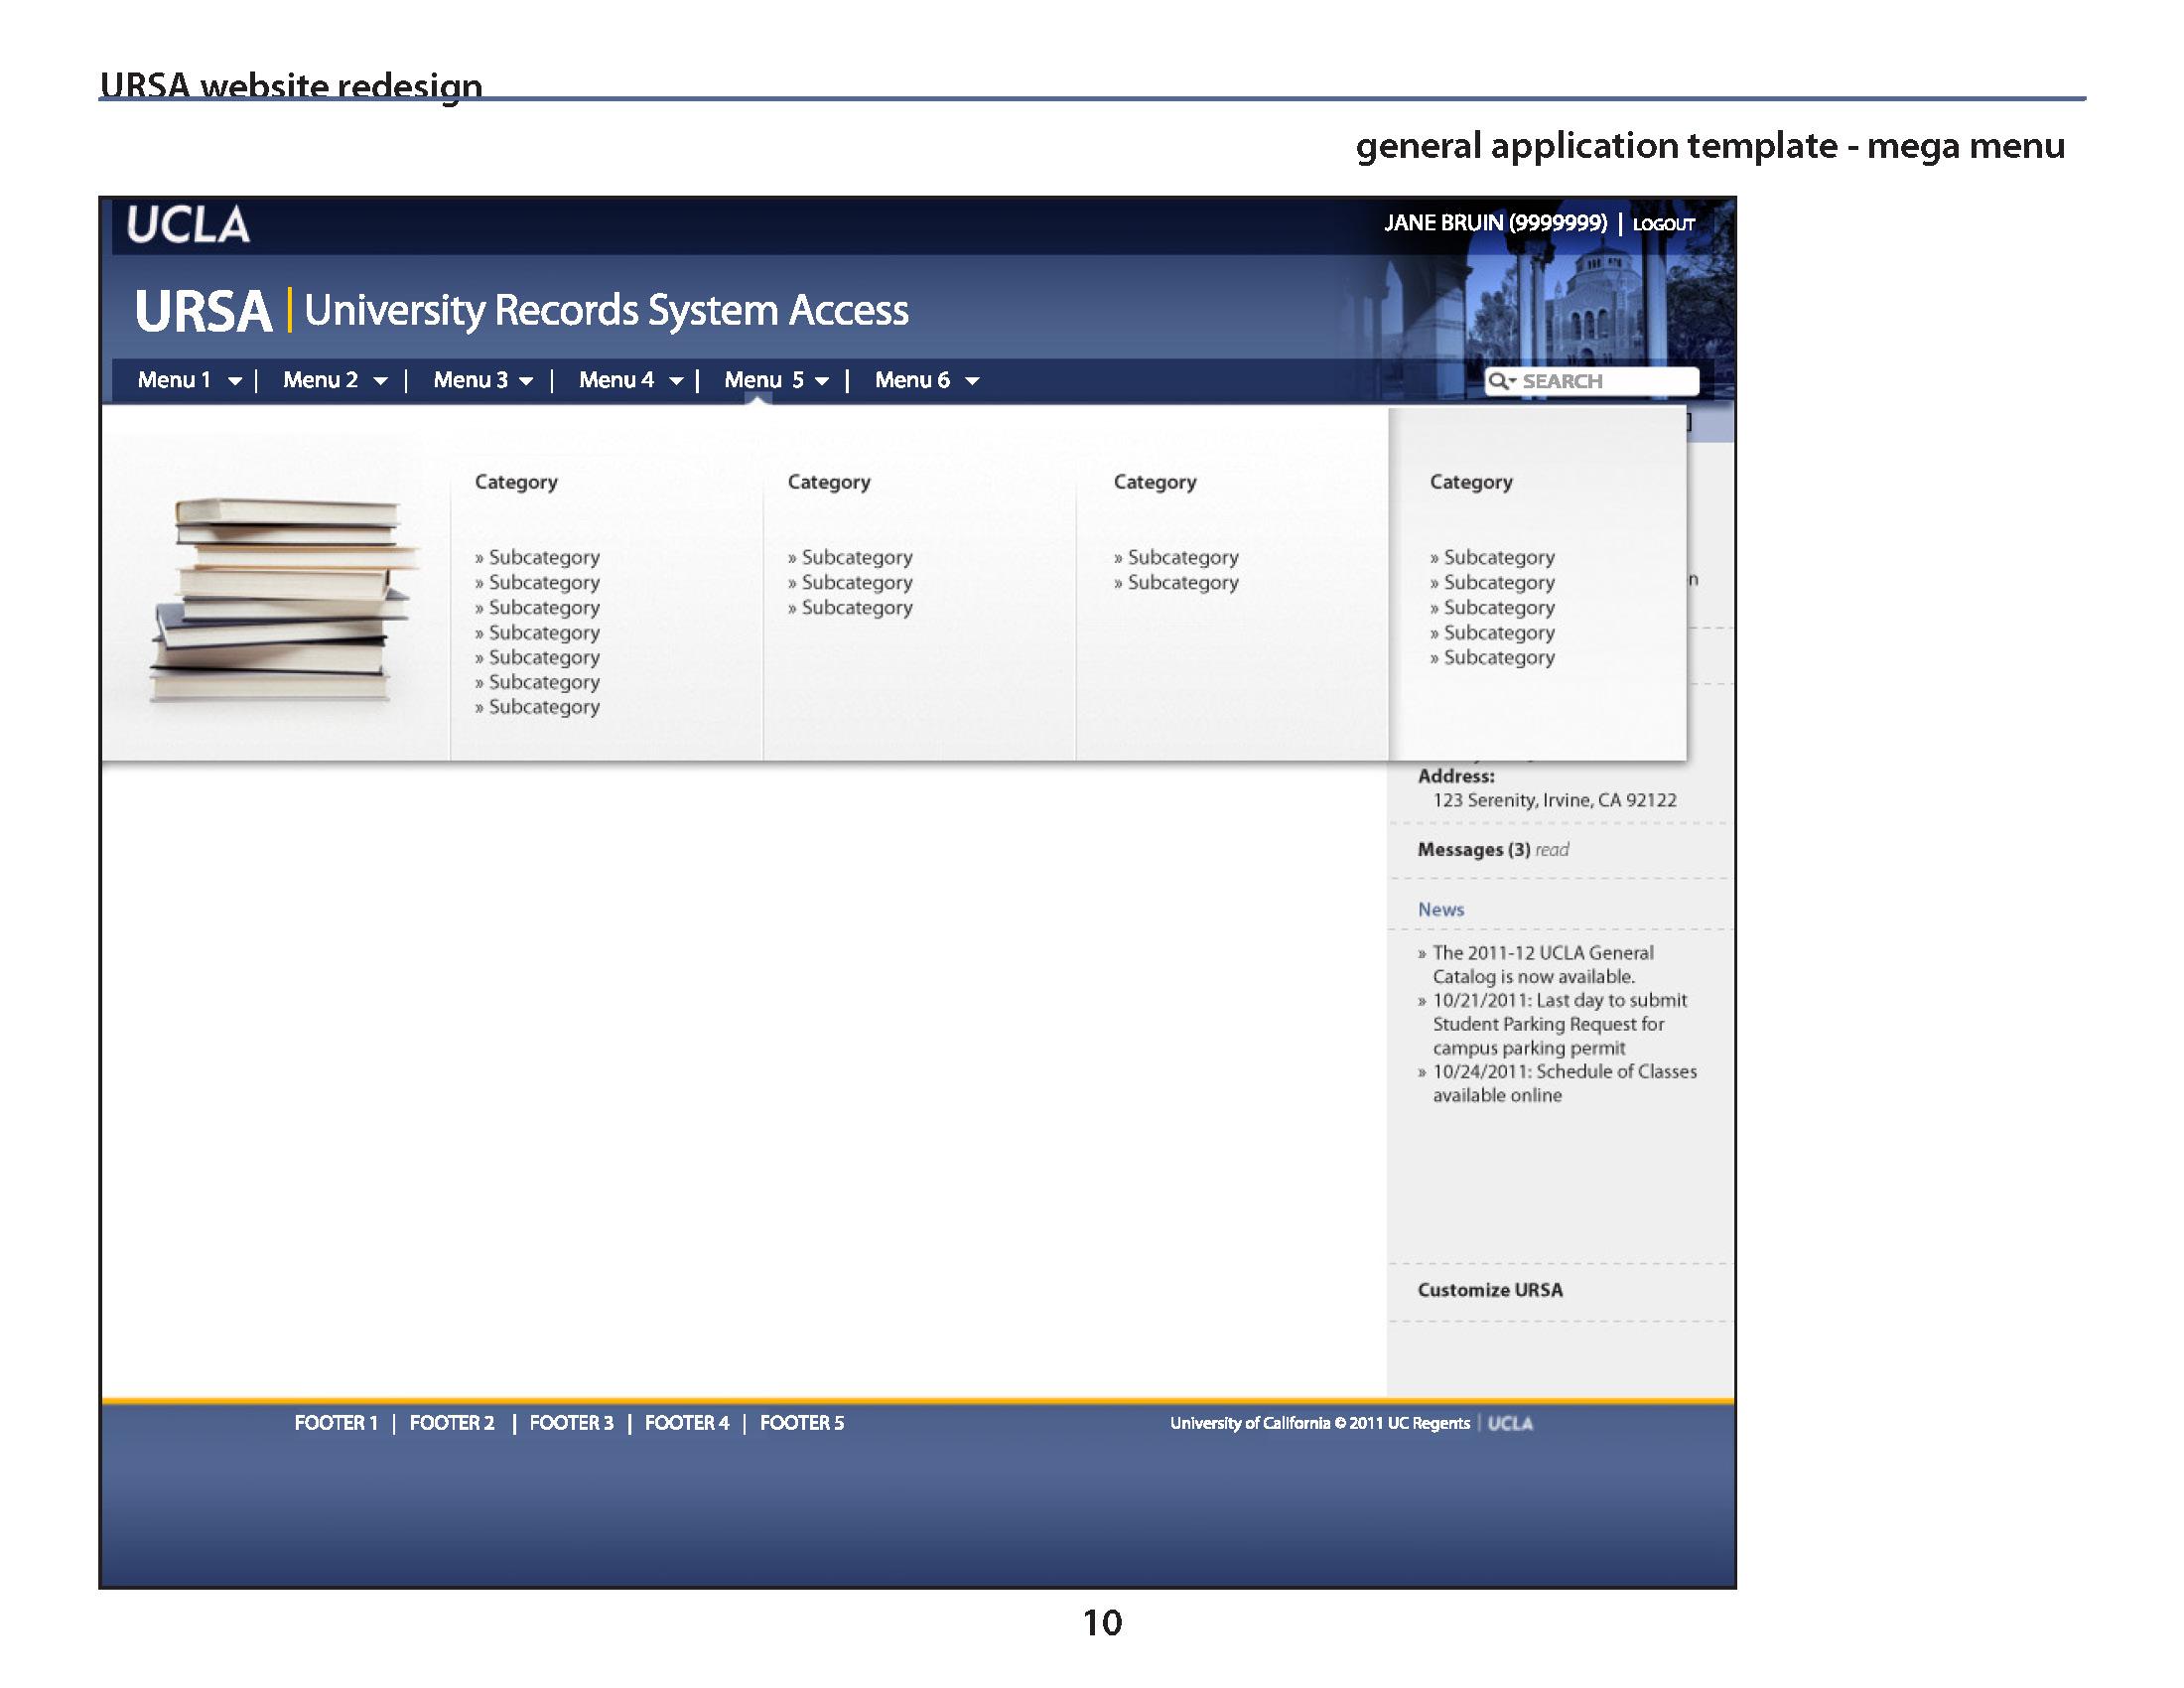 redesign-presentation_v4_Page_10.jpg